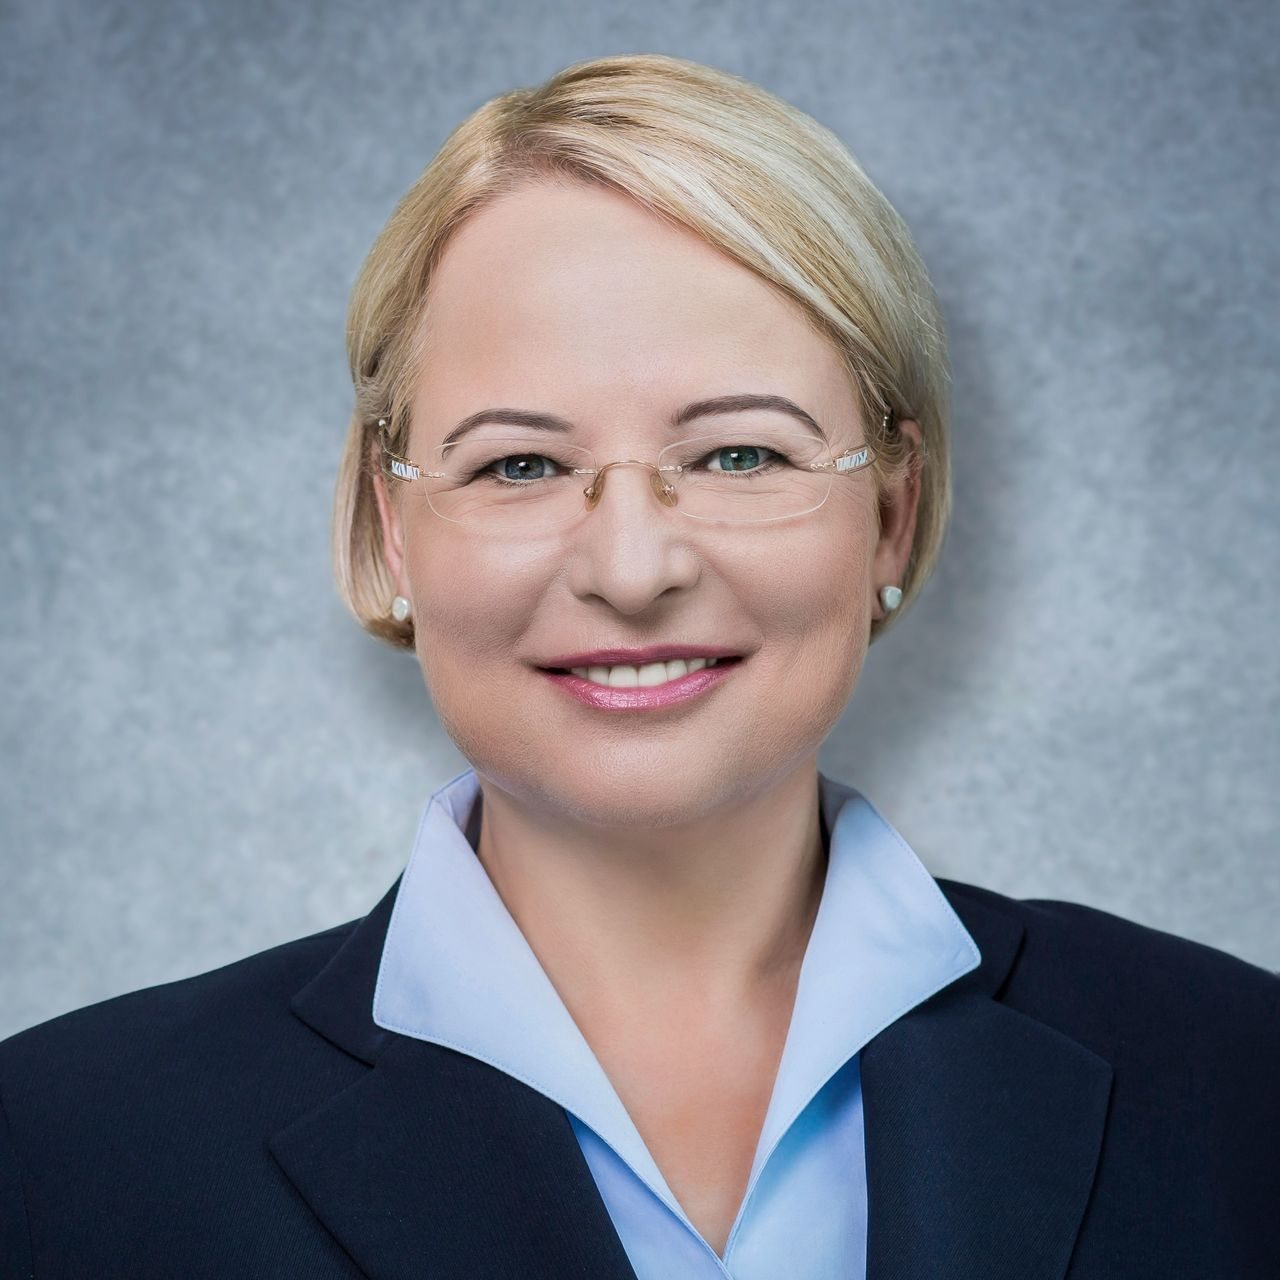 Sabine Maassen - Biography